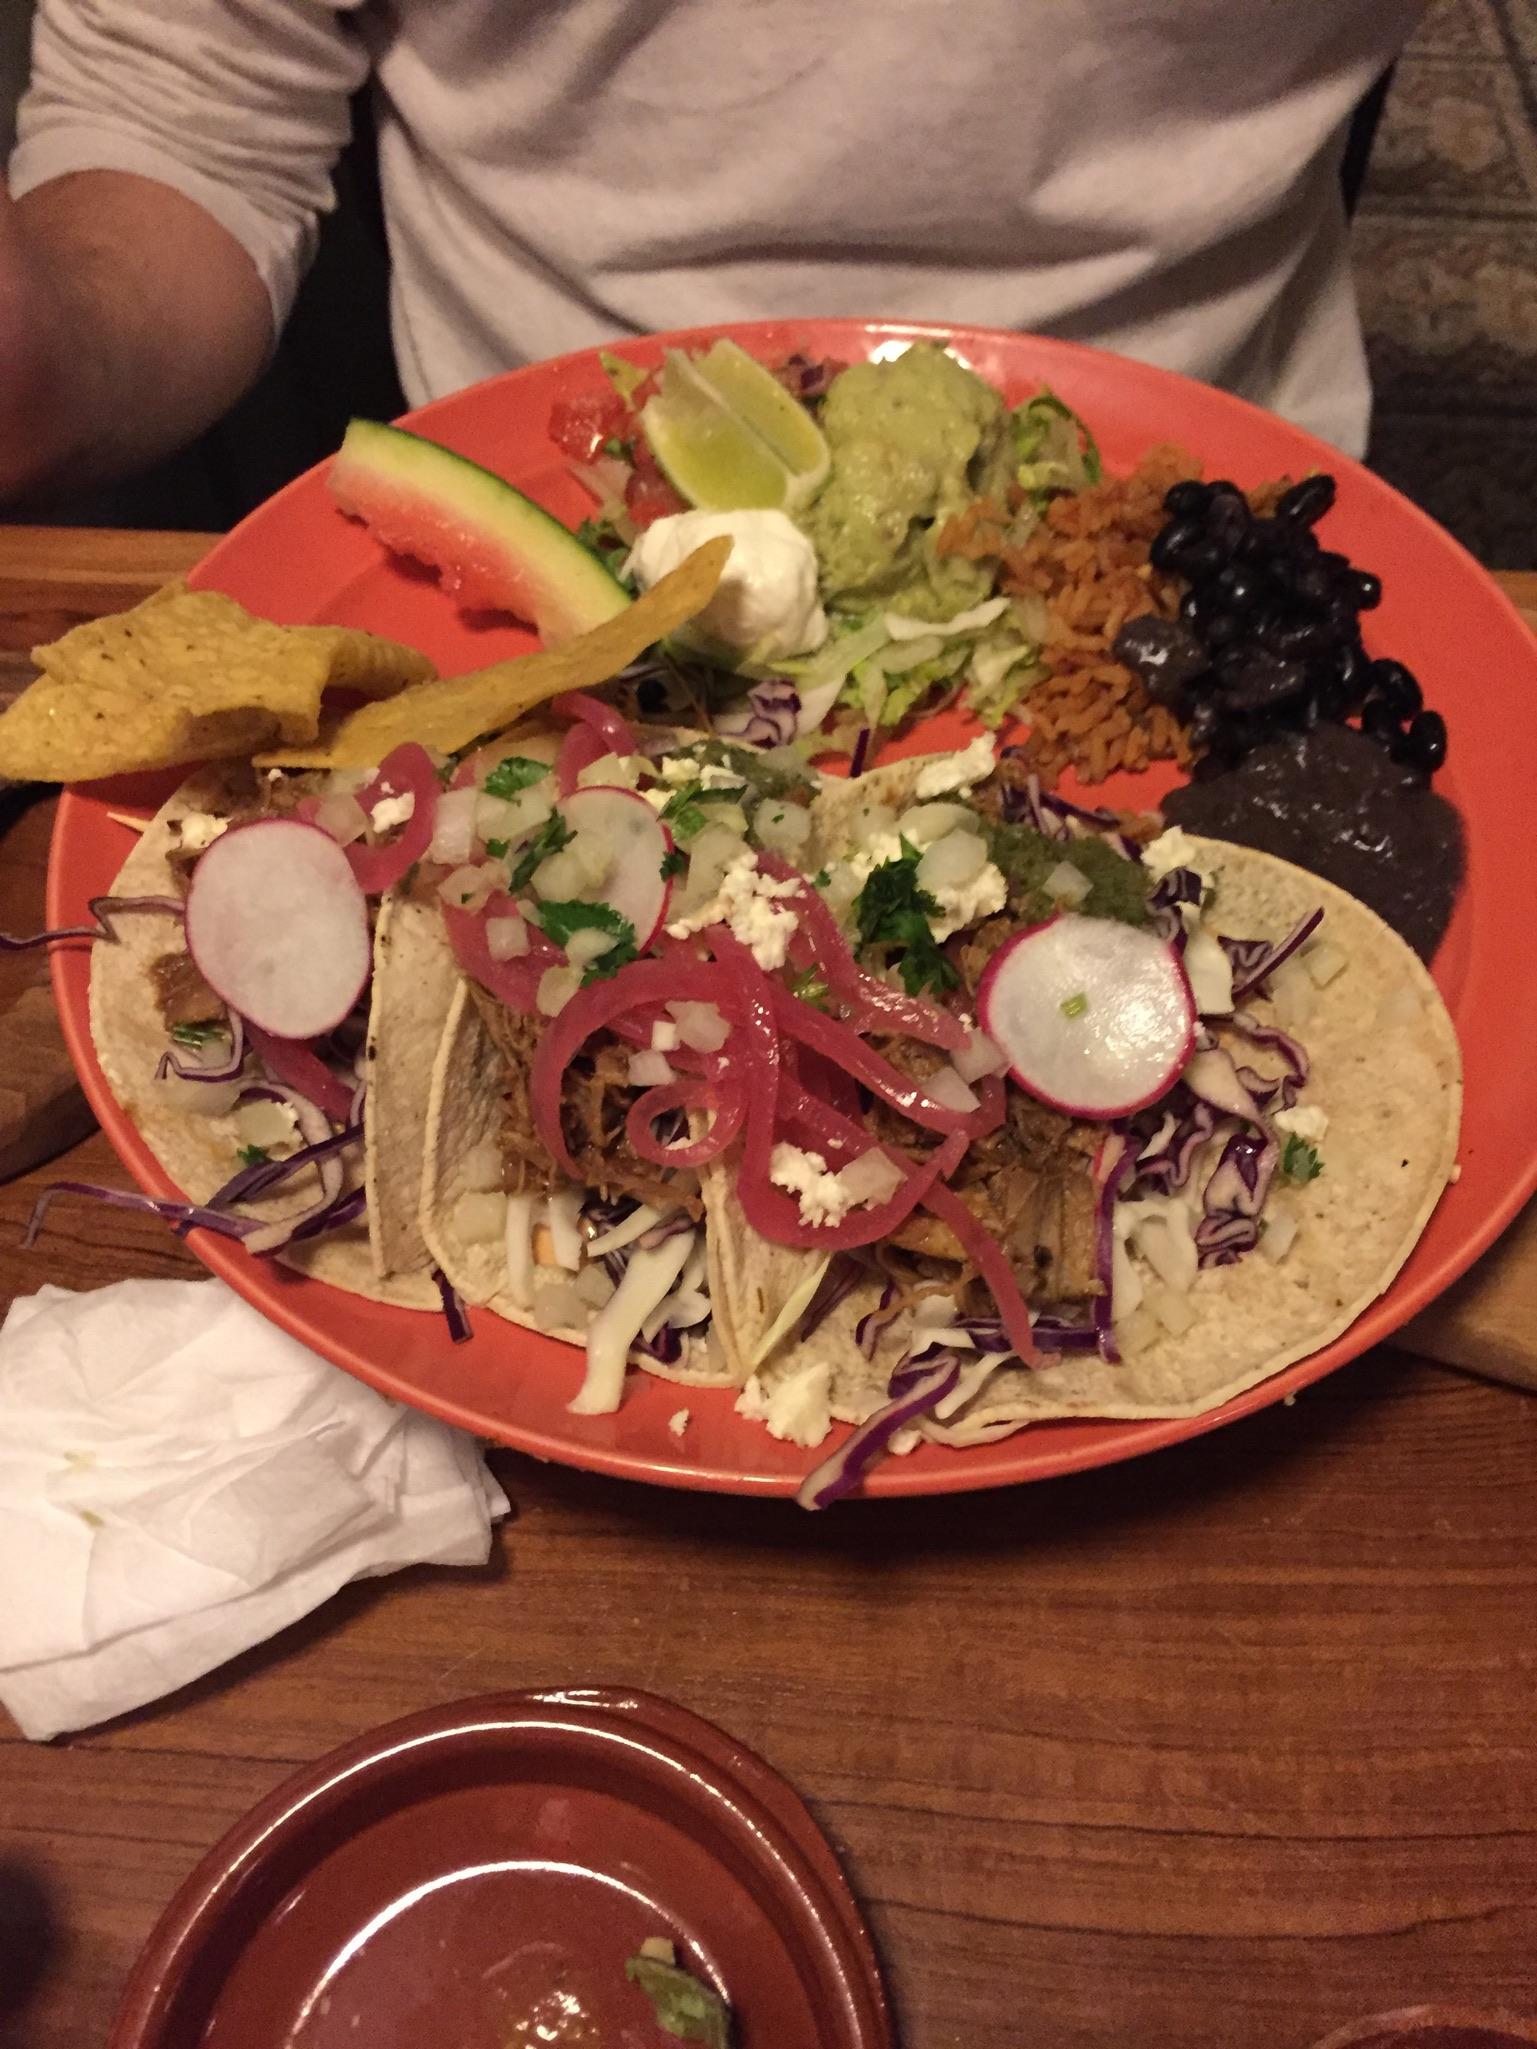 Pork tacos at Cantina 023 in Haarlem.